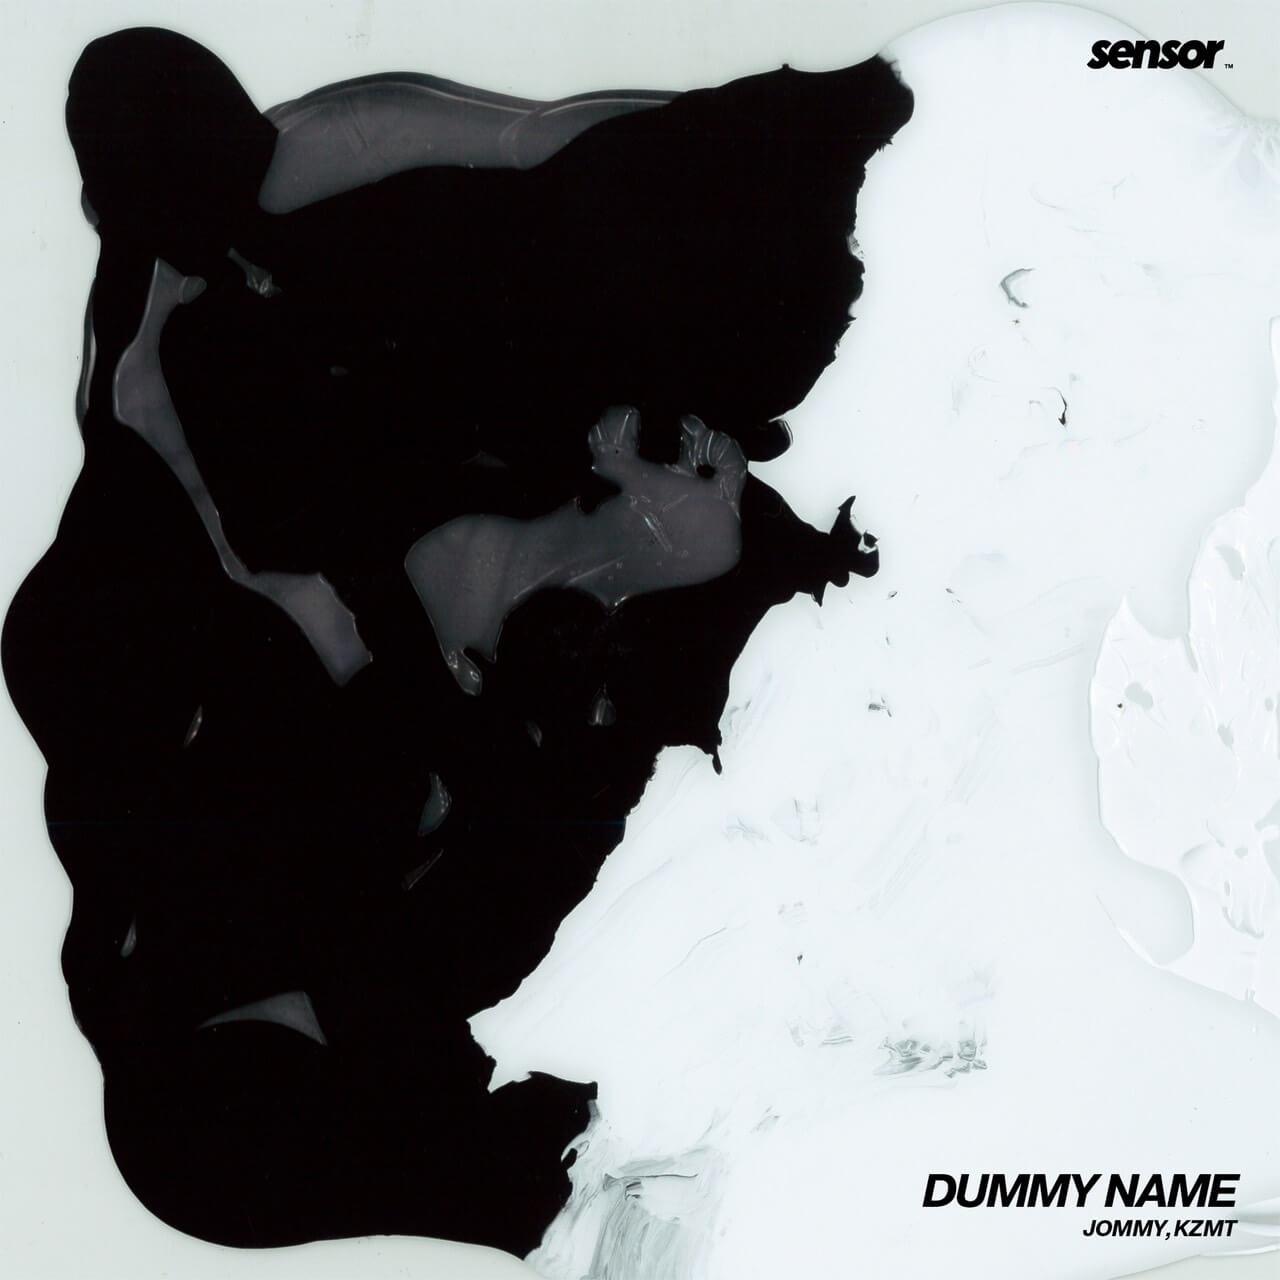 <EDGE HOUSE>レジデントのJOMMYとKZMTが「DUMMY NAME」をリリース music210921-jommy-kzmt-1